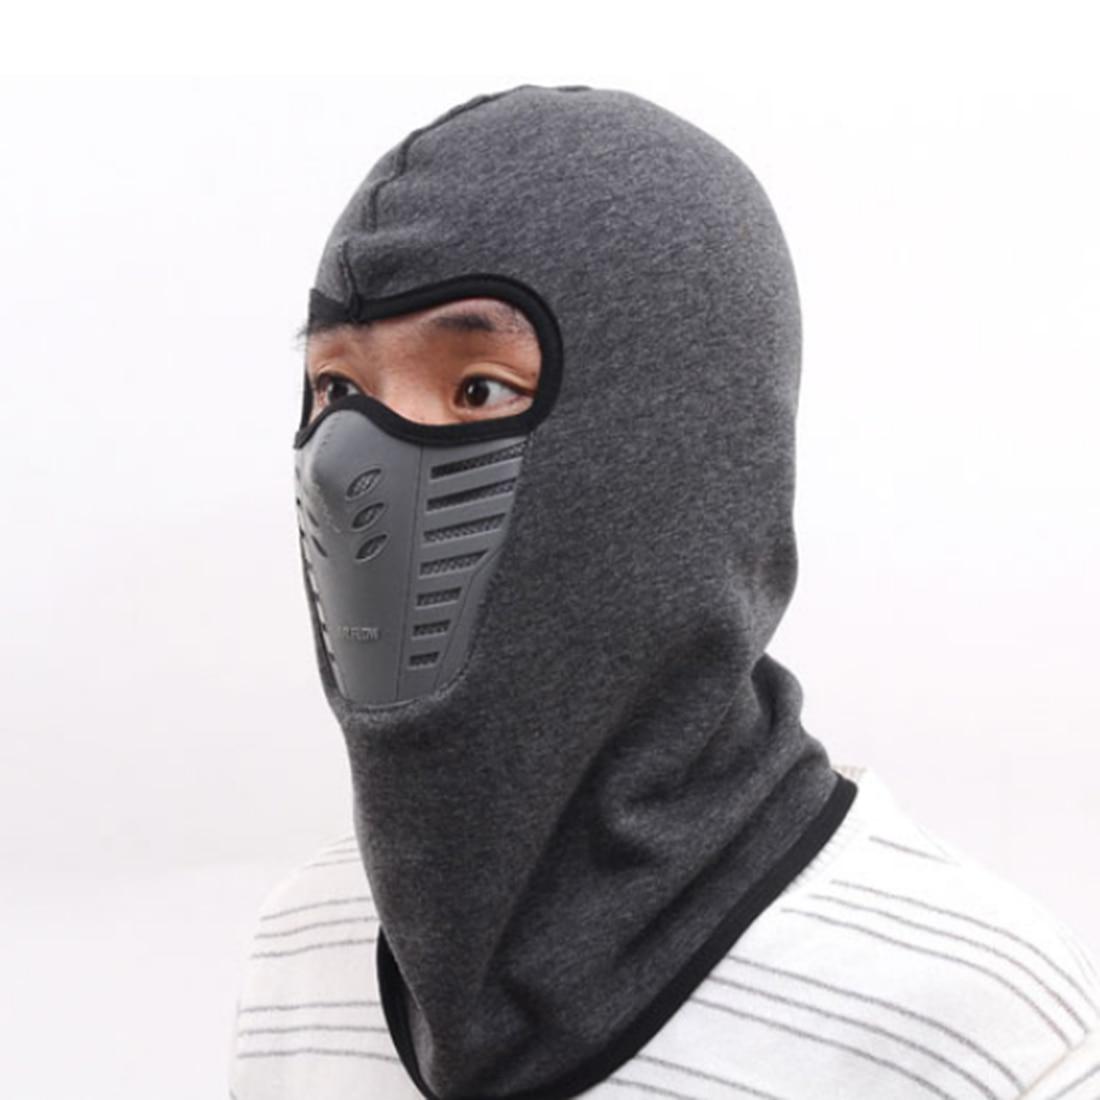 Full face mask neck warmer hood balaclava outdoor winter sports hats - Men Women Winter Neck Full Face Mask Thermal Fleece Protection Hat Ski Hood Helmet Cap